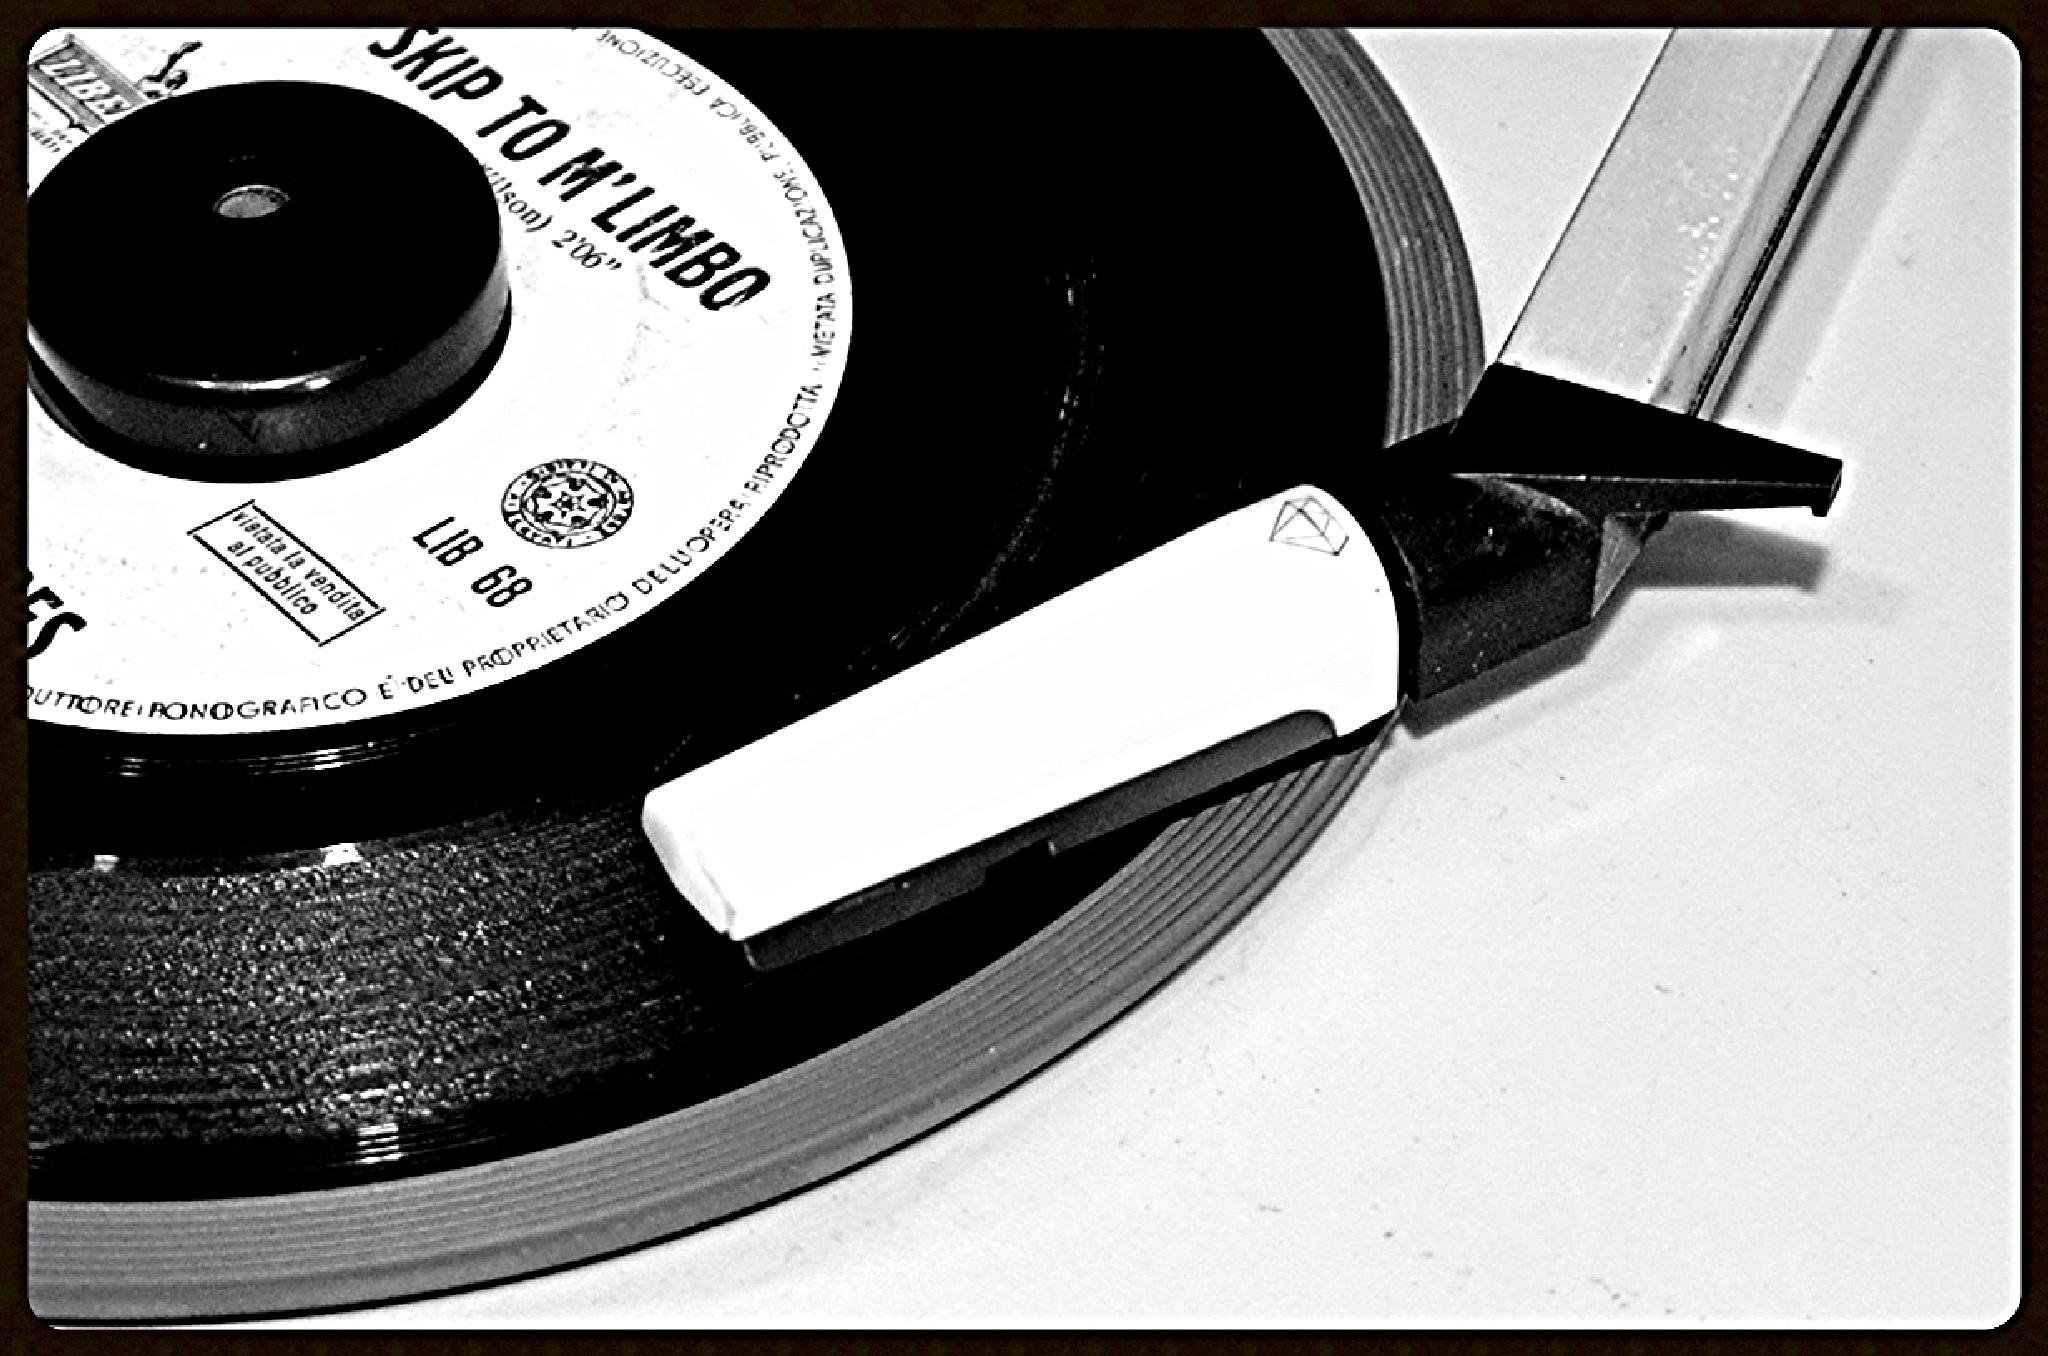 Portable record-player by monicarla